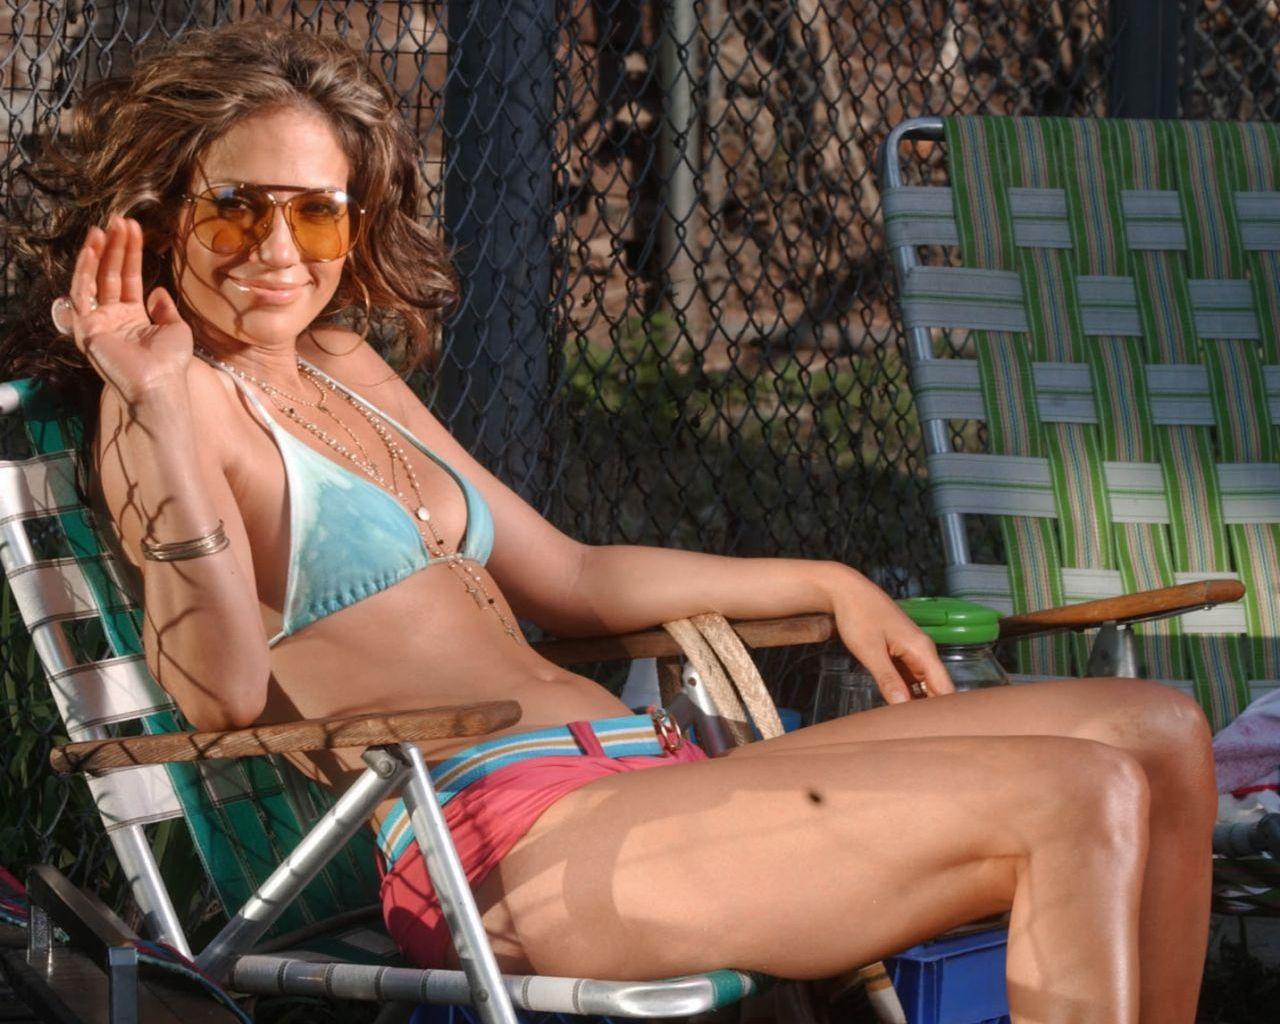 http://1.bp.blogspot.com/-E_LPIx3GAWk/TpcMiadIAaI/AAAAAAAABeY/SoeyjbcBrp8/s1600/Jennifer+Lopez+Bikini+%252817%2529.jpg